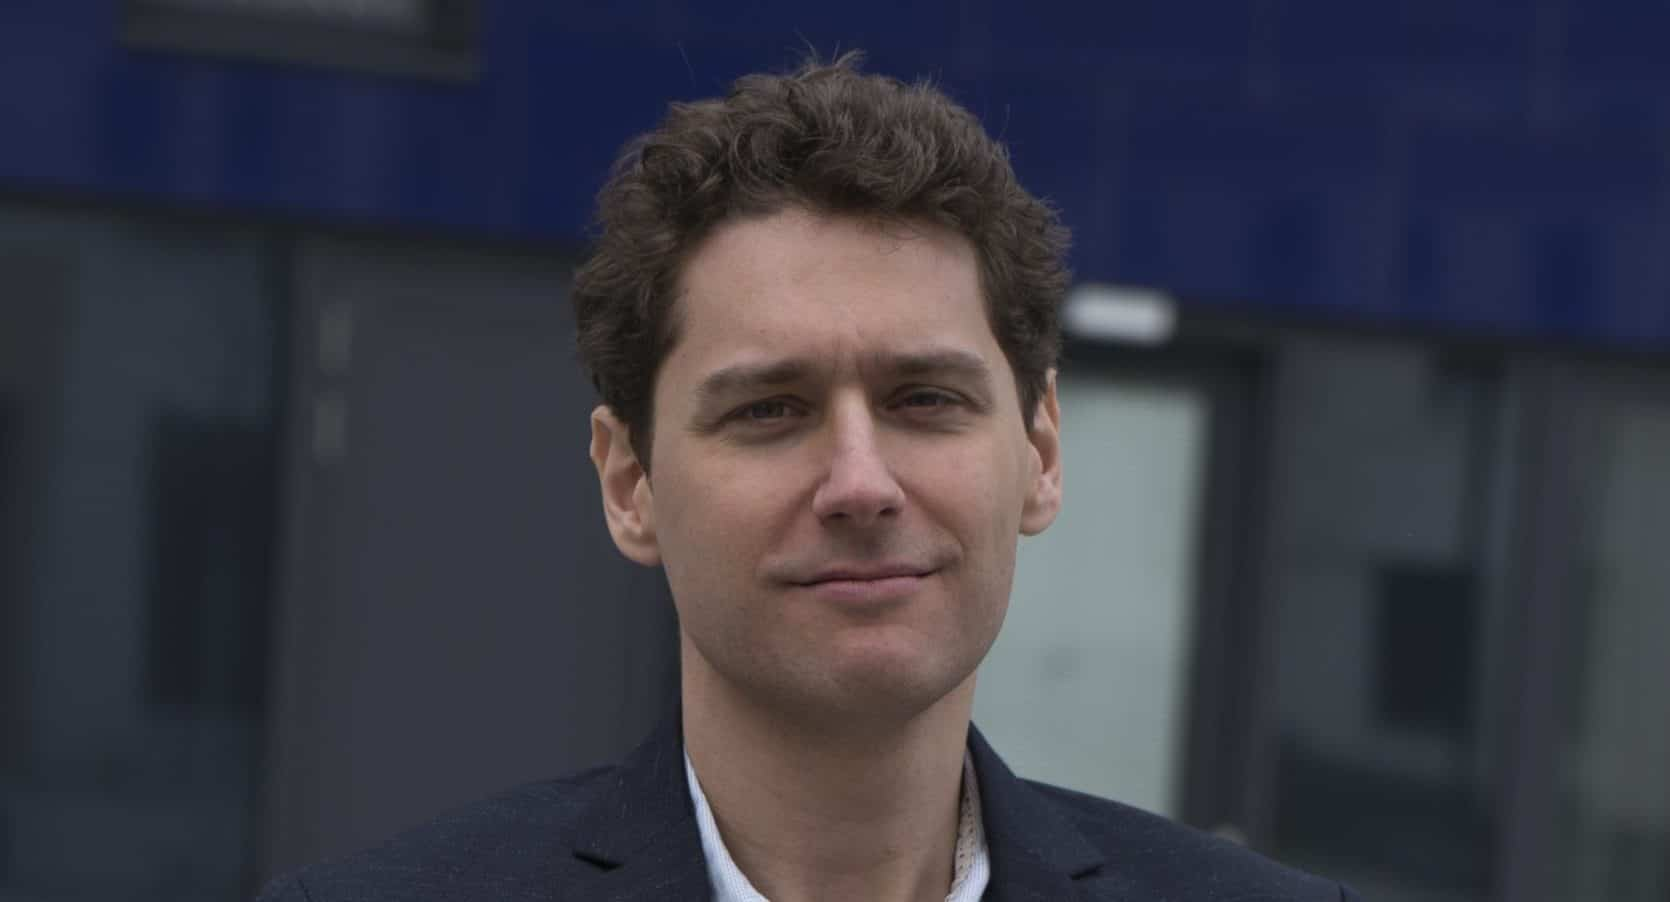 Michael Swarowsky